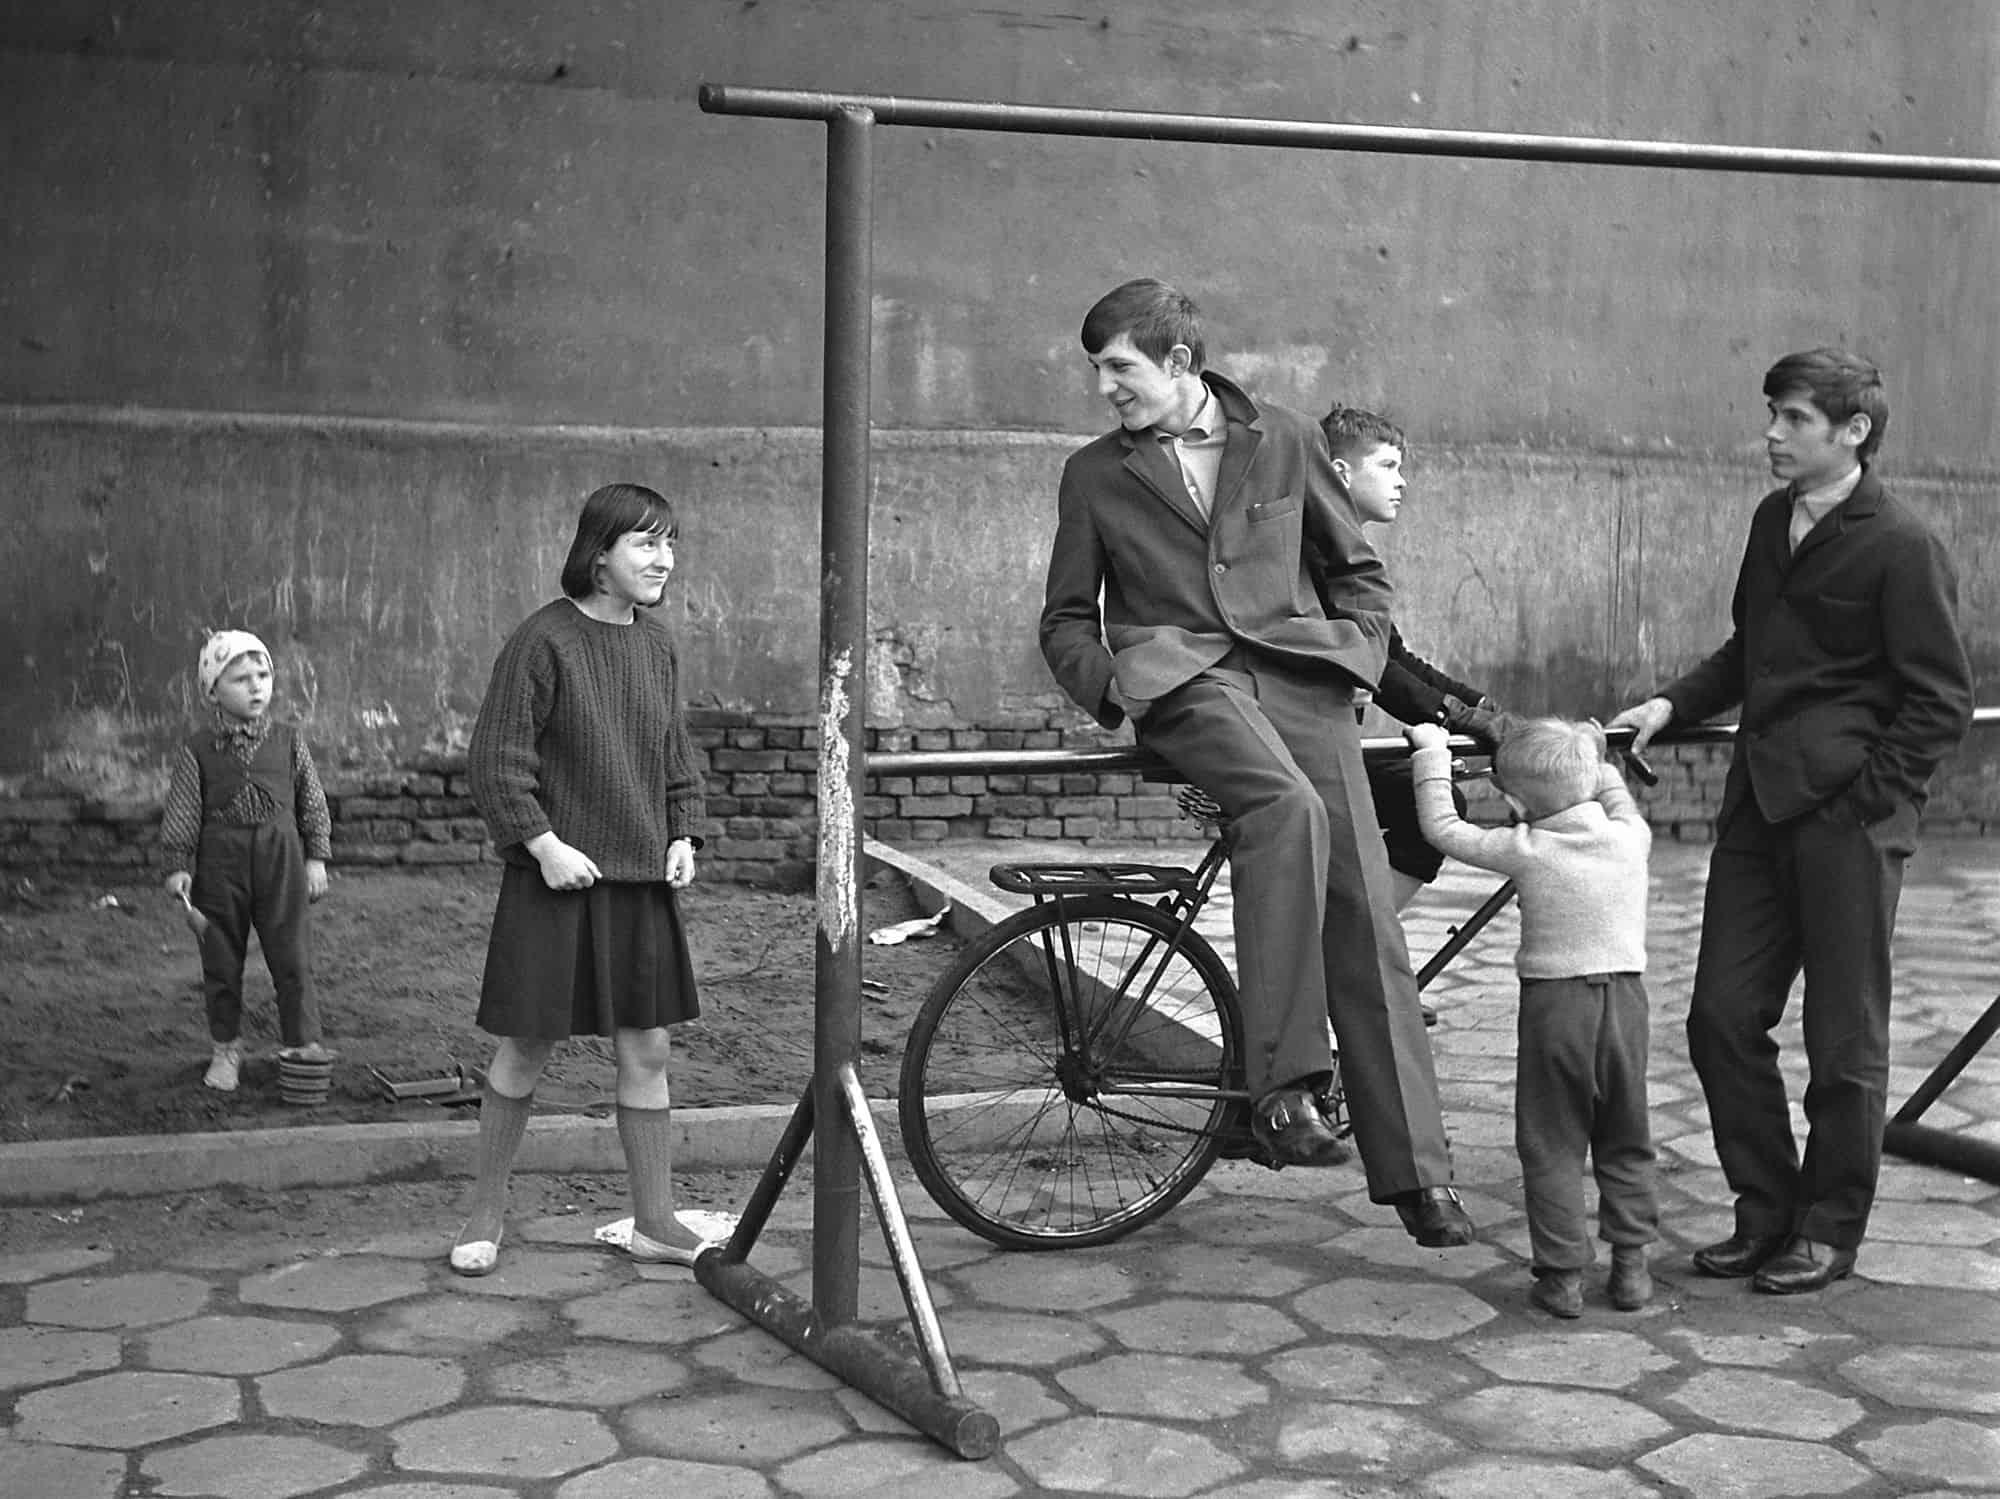 Bogdan Dziworski, Łódź 1966, photo